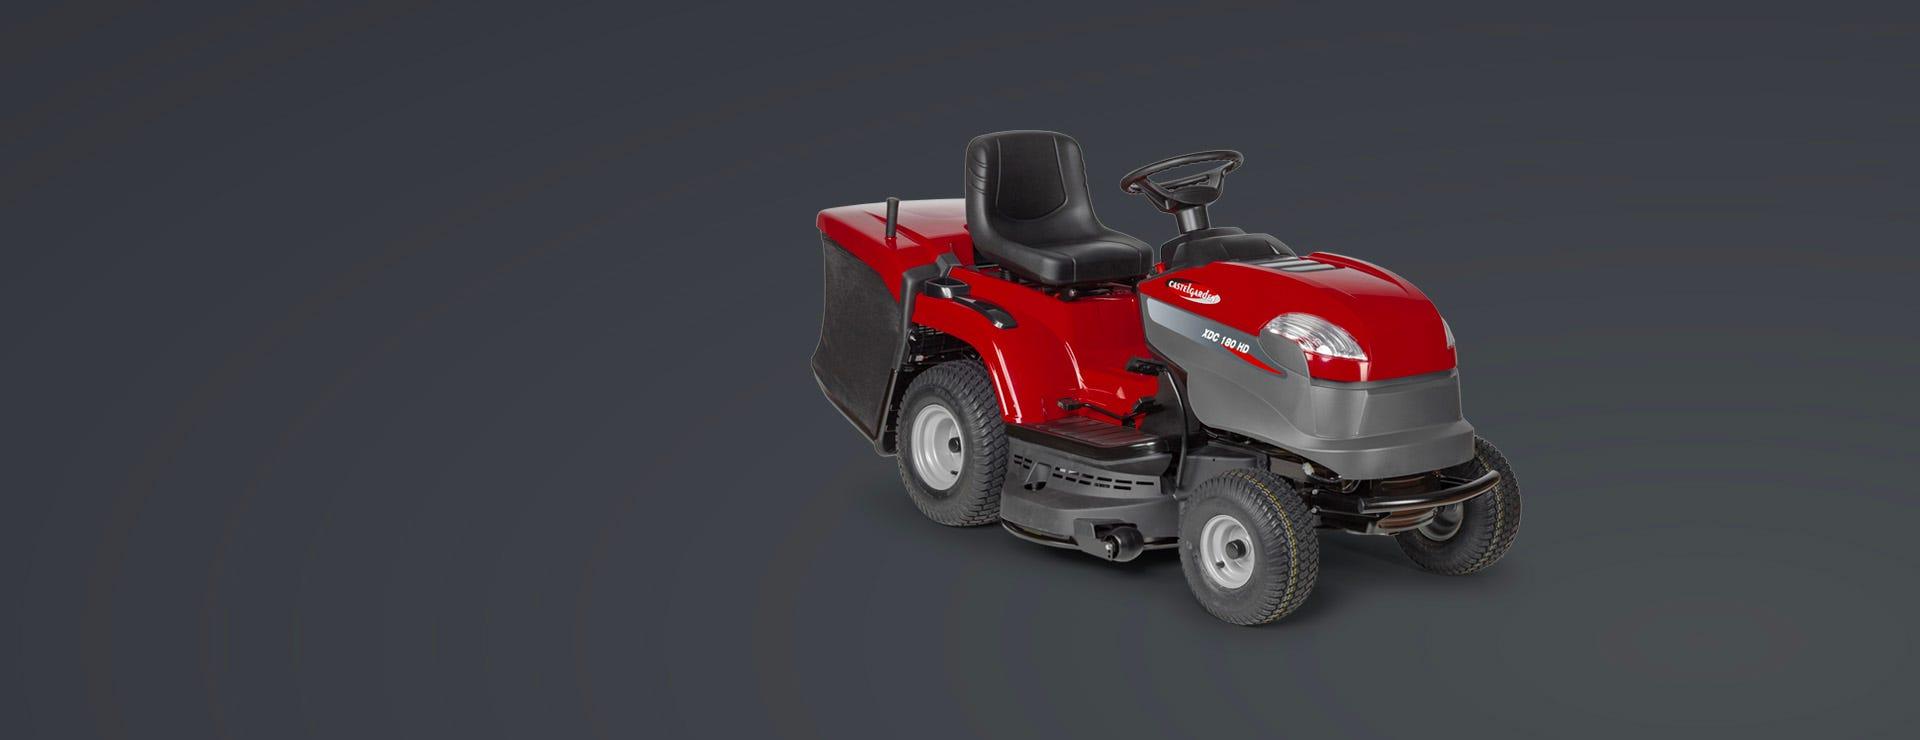 castelgarden-tracteur de jardin-thermique-tondeuse autoportee-xdc 180 hd